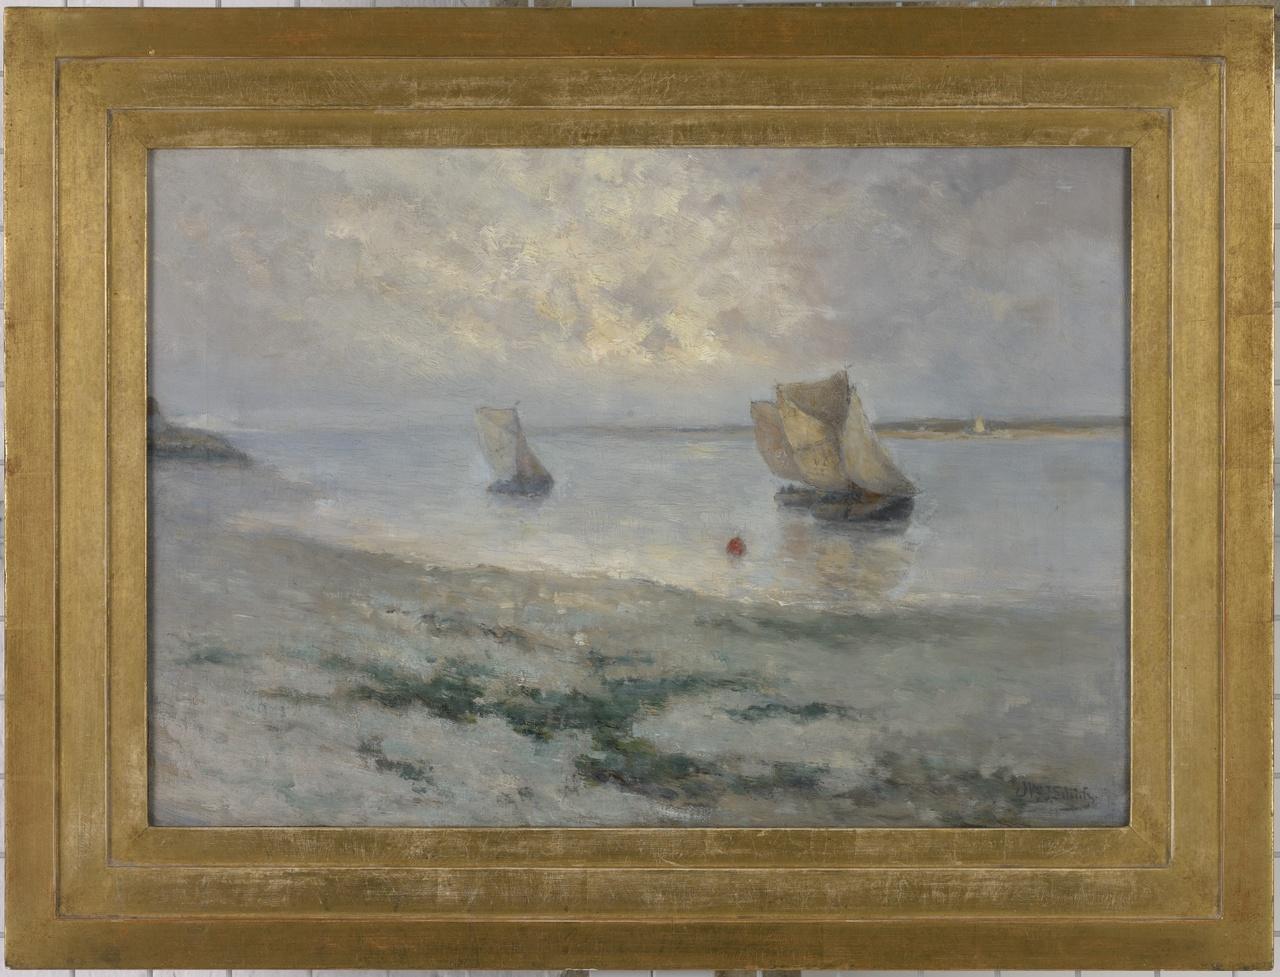 Hoogaarzen op weg naar Veere, Willem Johannes Schütz